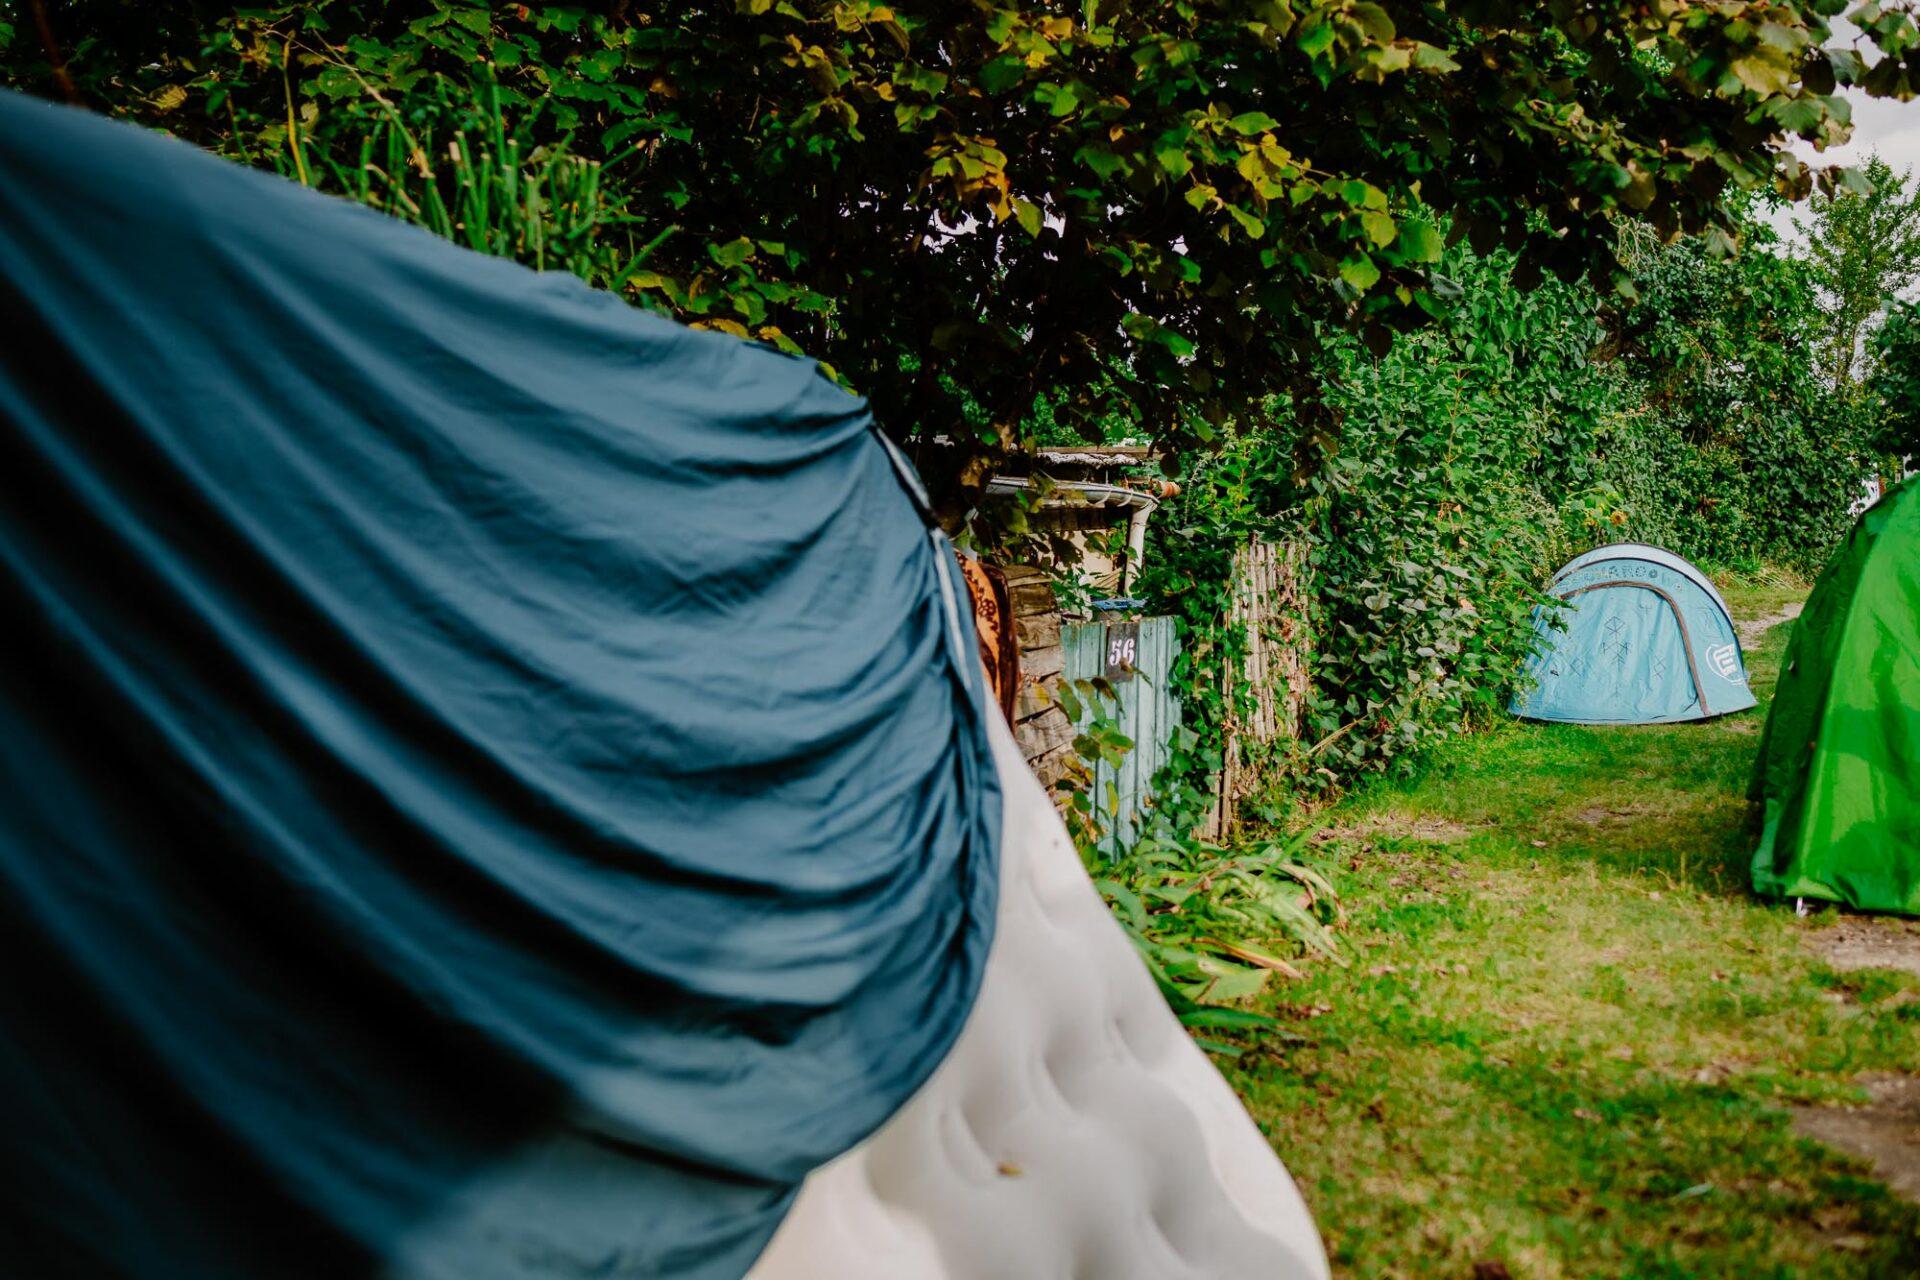 Jardins ouvriers aubervilliers 30 - Dagmara Bojenko - Eco-conscious Weddings, Births & Families